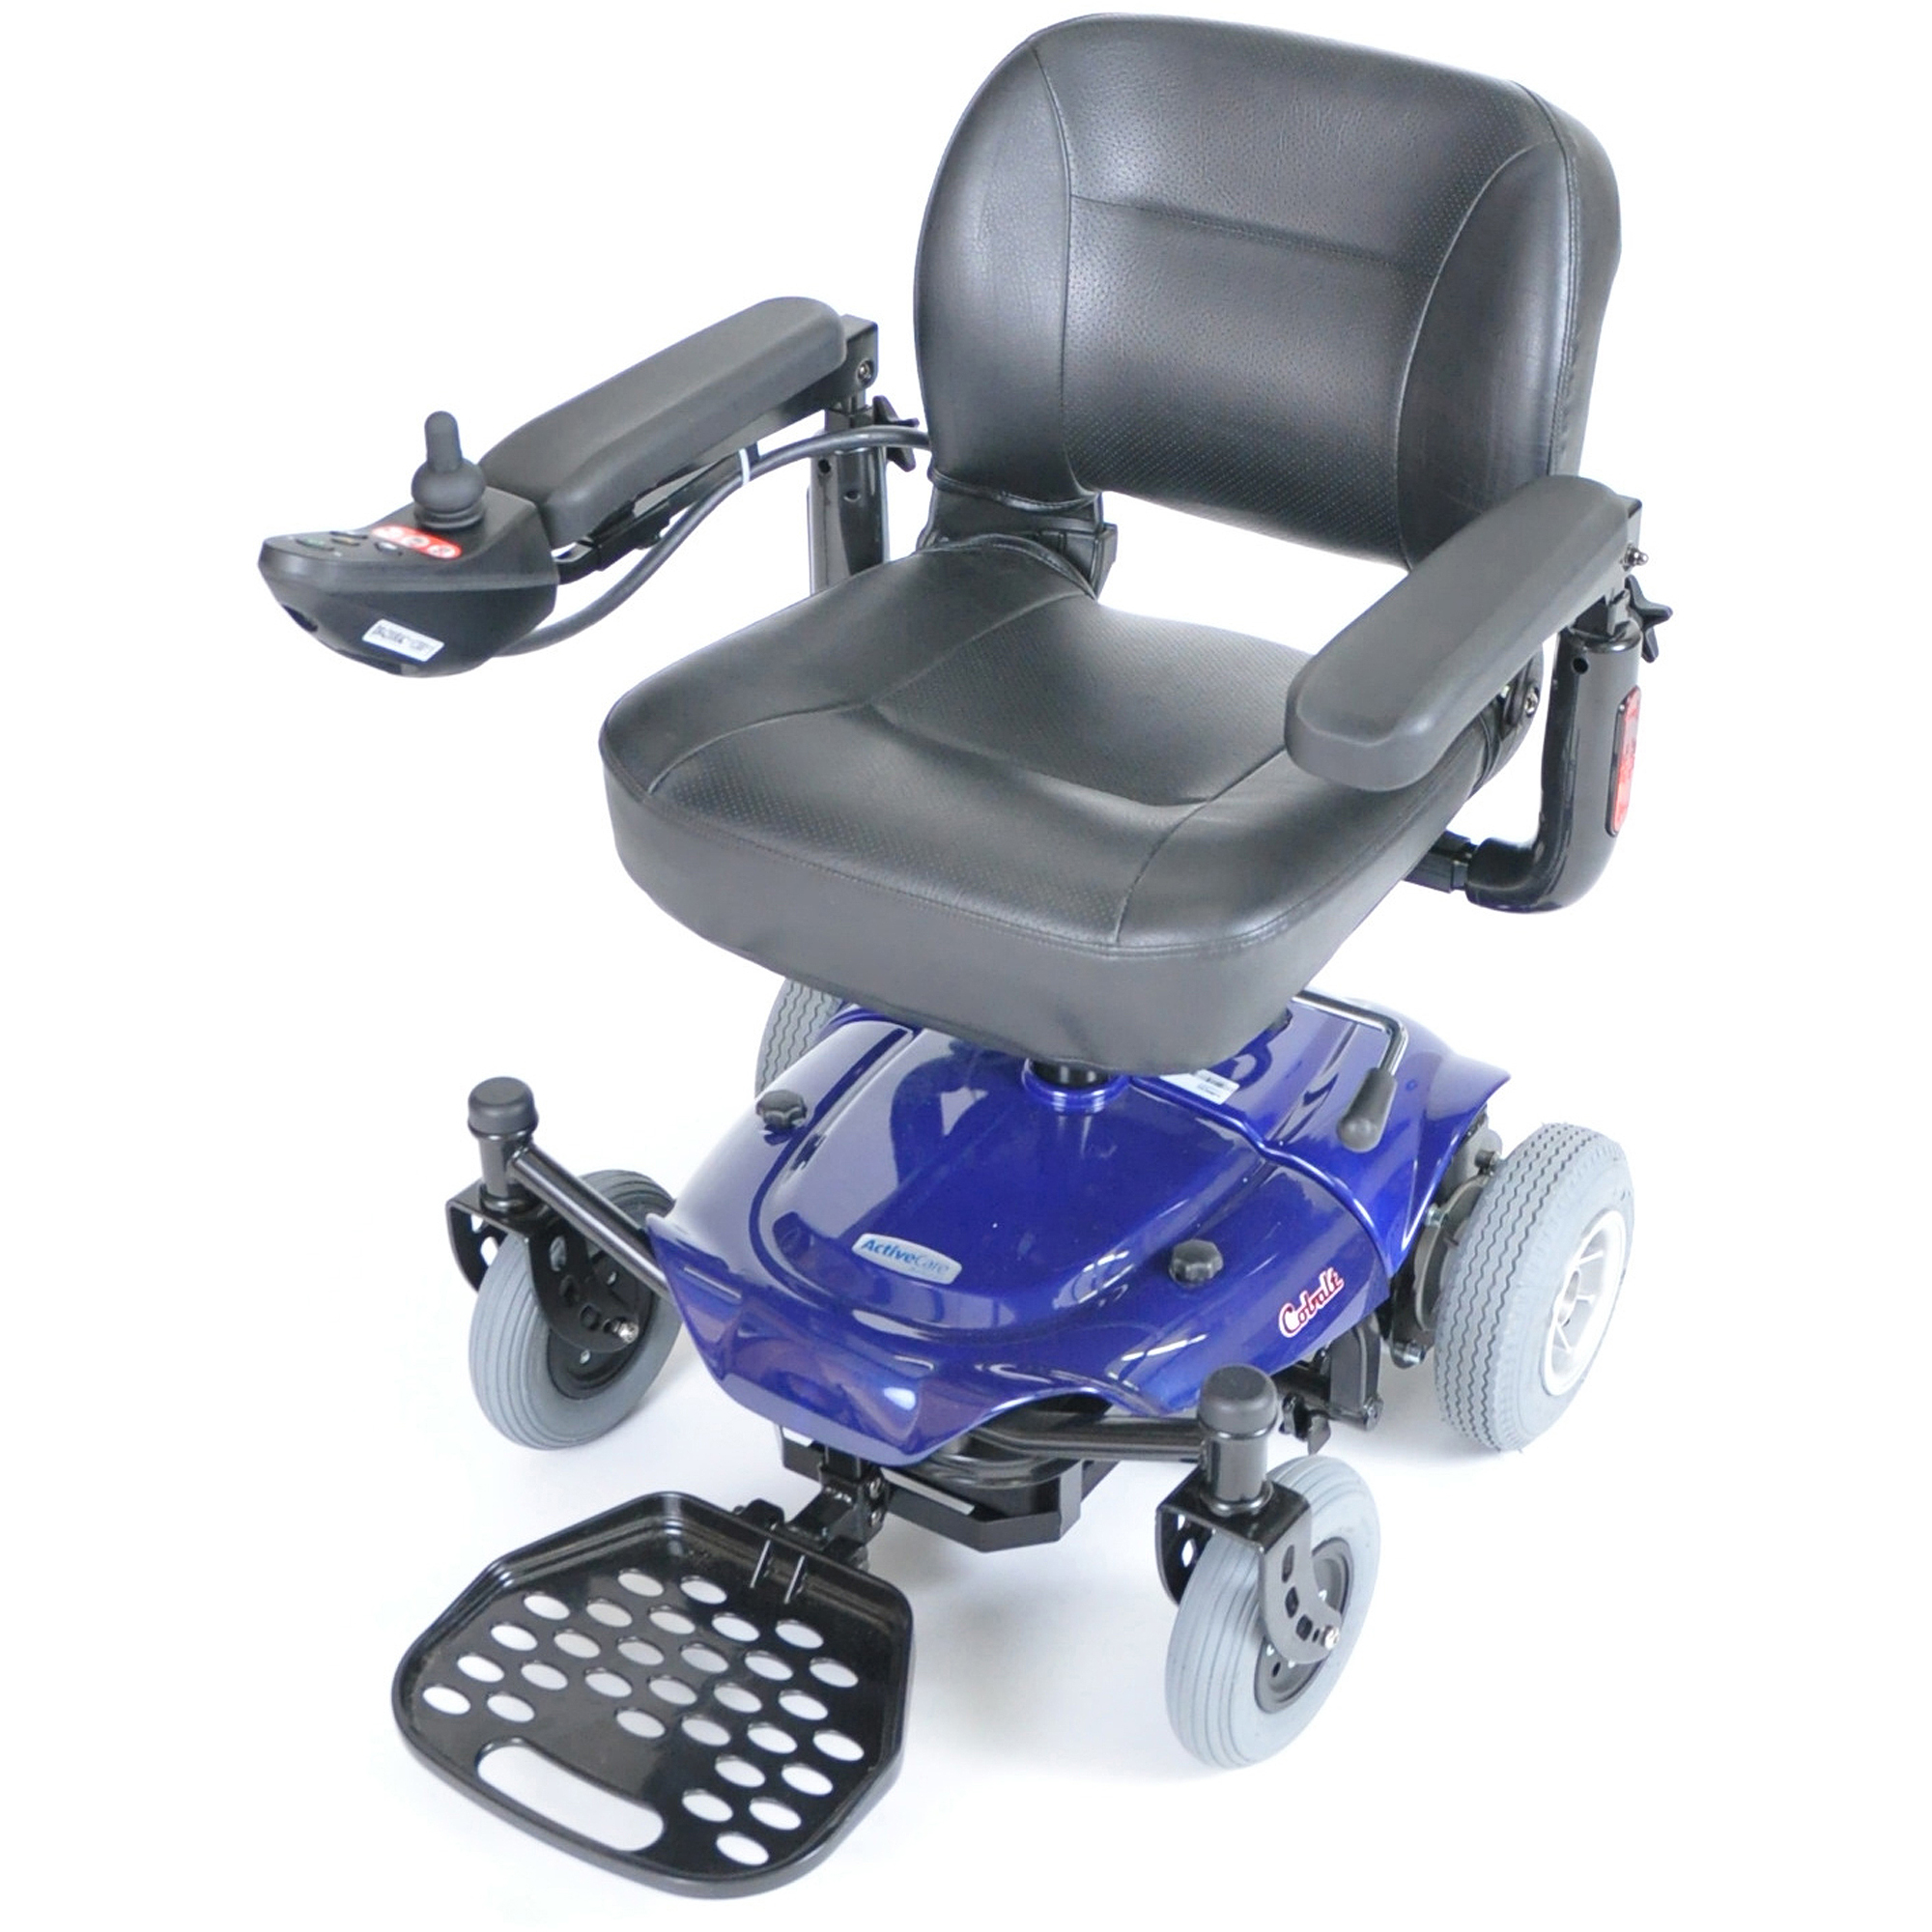 transport chairs at walmart sliding bath chair drive medical travelite wheelchair in a